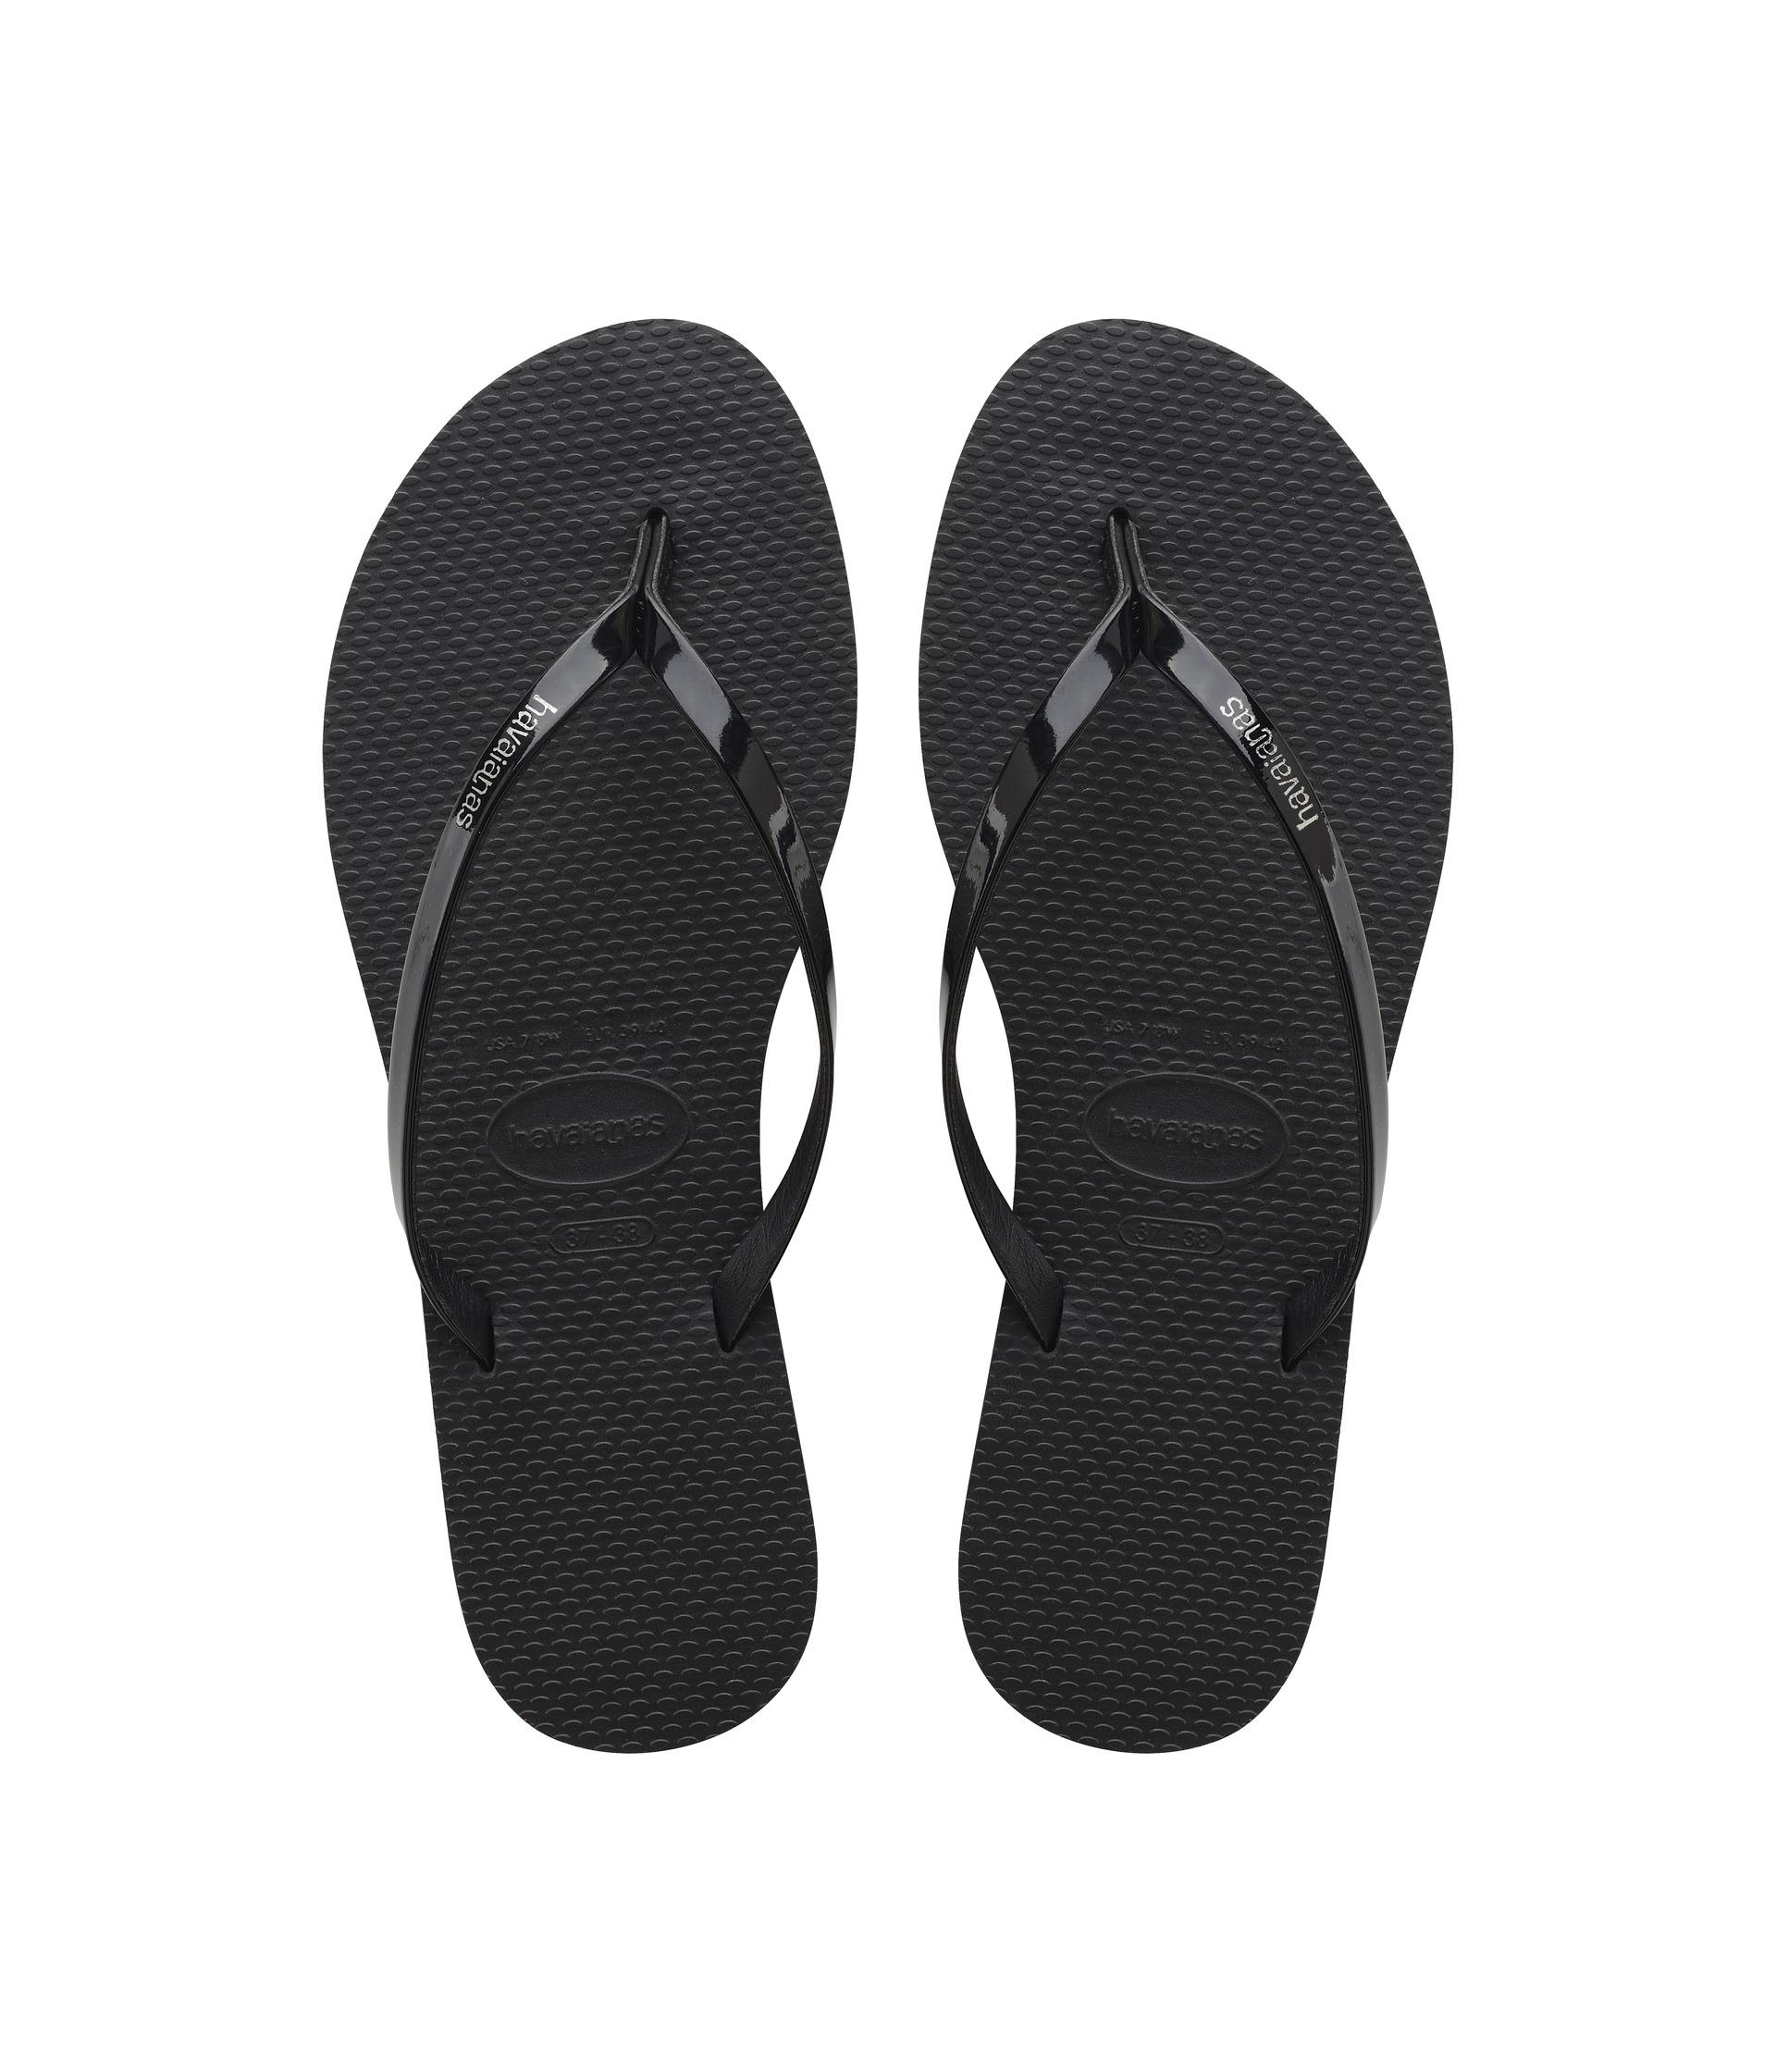 Black rainbow sandals with crystals - Black Rainbow Sandals With Crystals 35